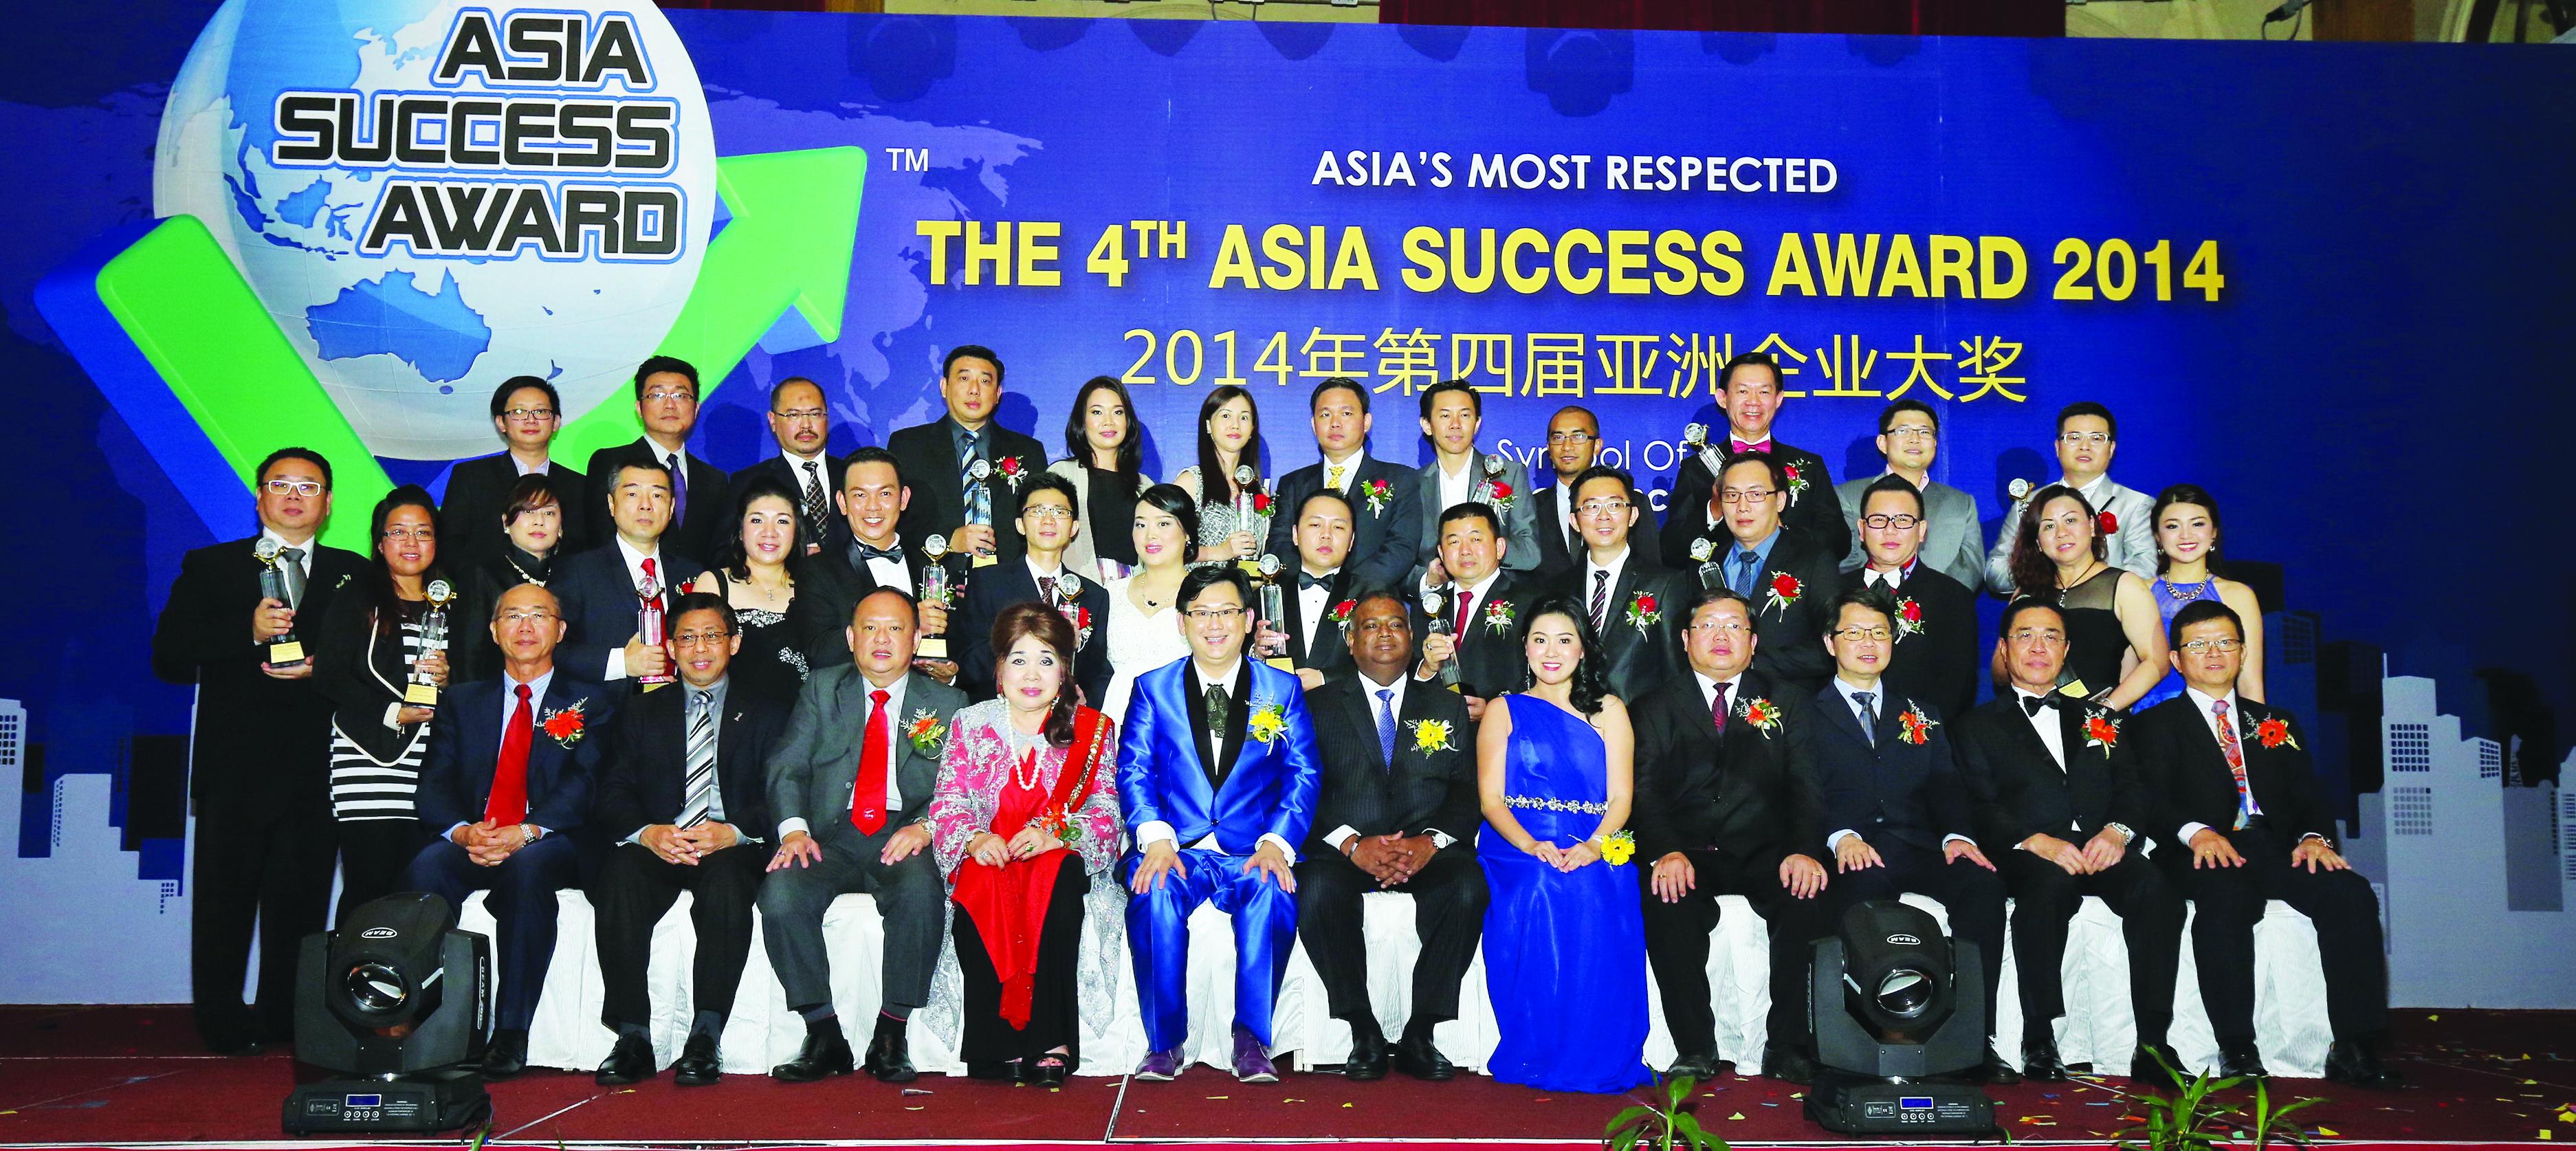 The 4th Asia Success Award